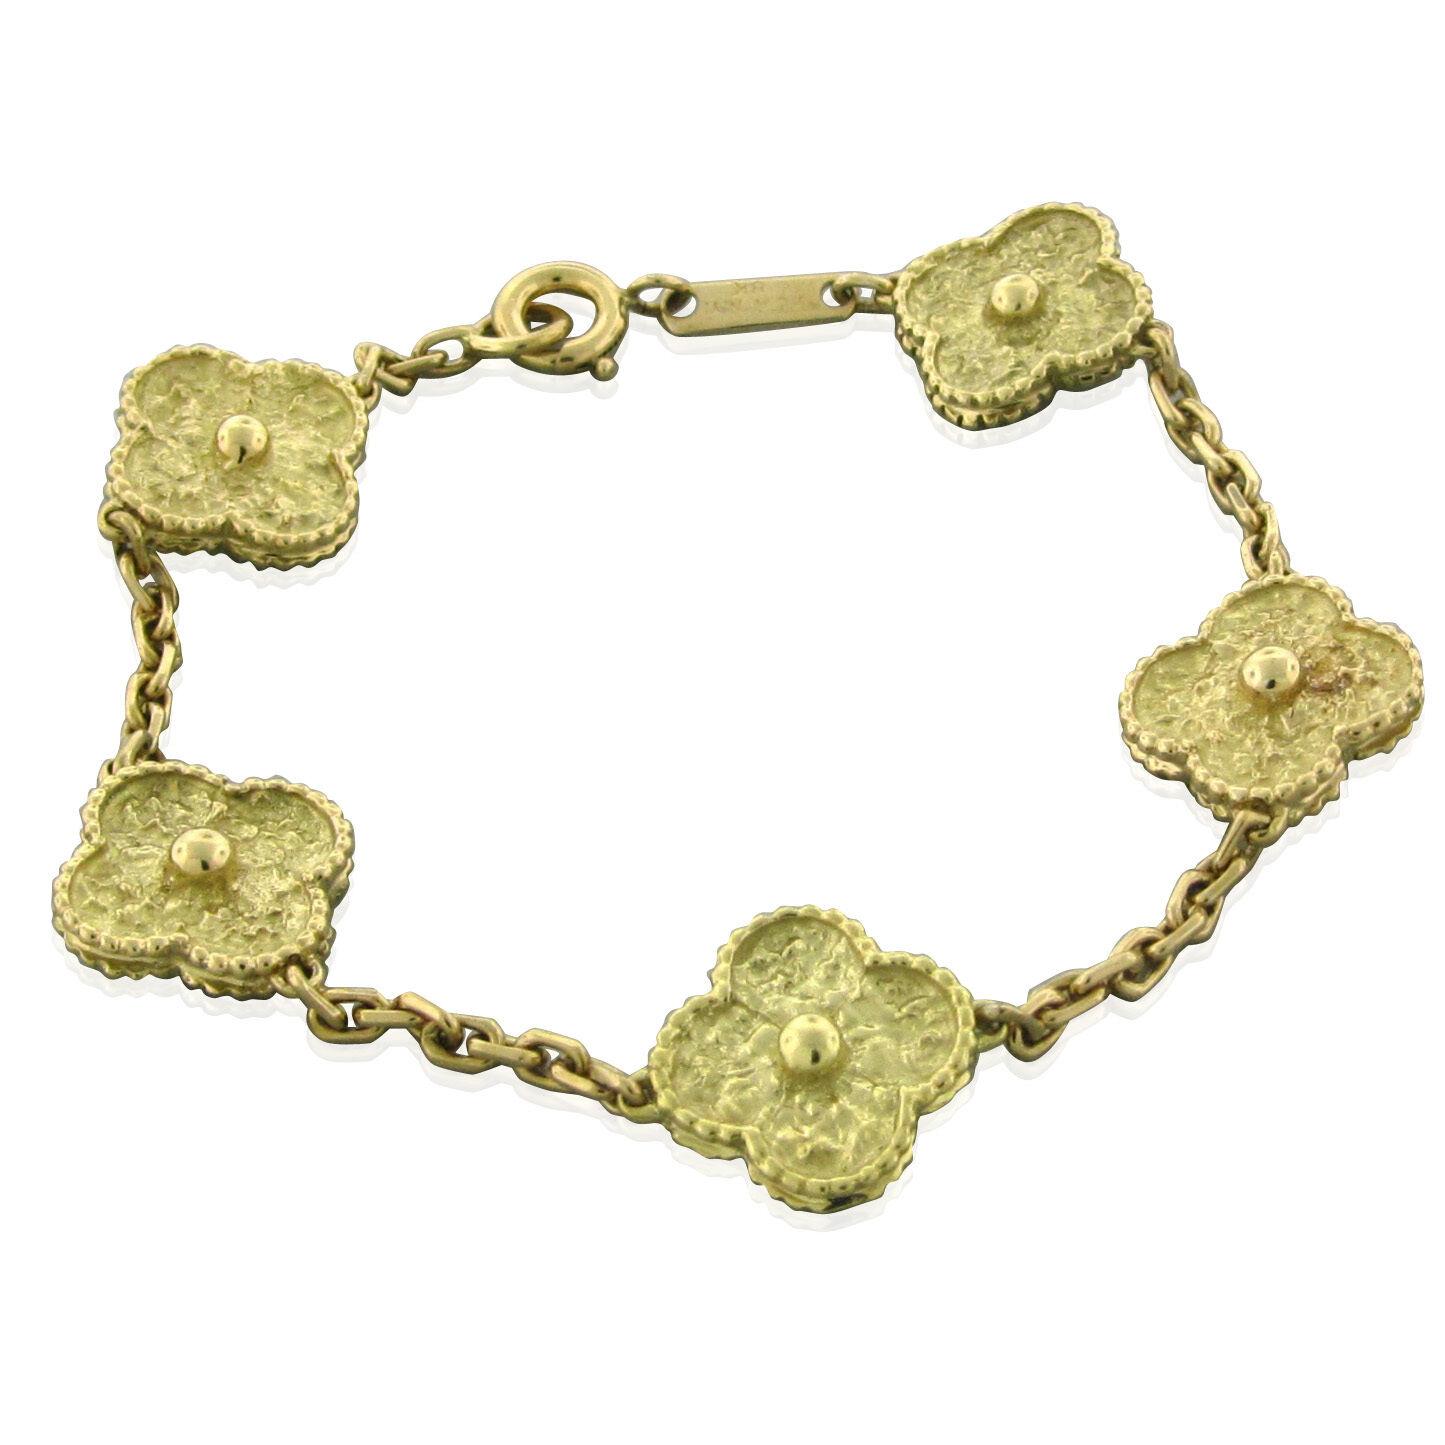 Vintage Van Cleef & Arpels Vca Alhambra 18k Yellow Gold